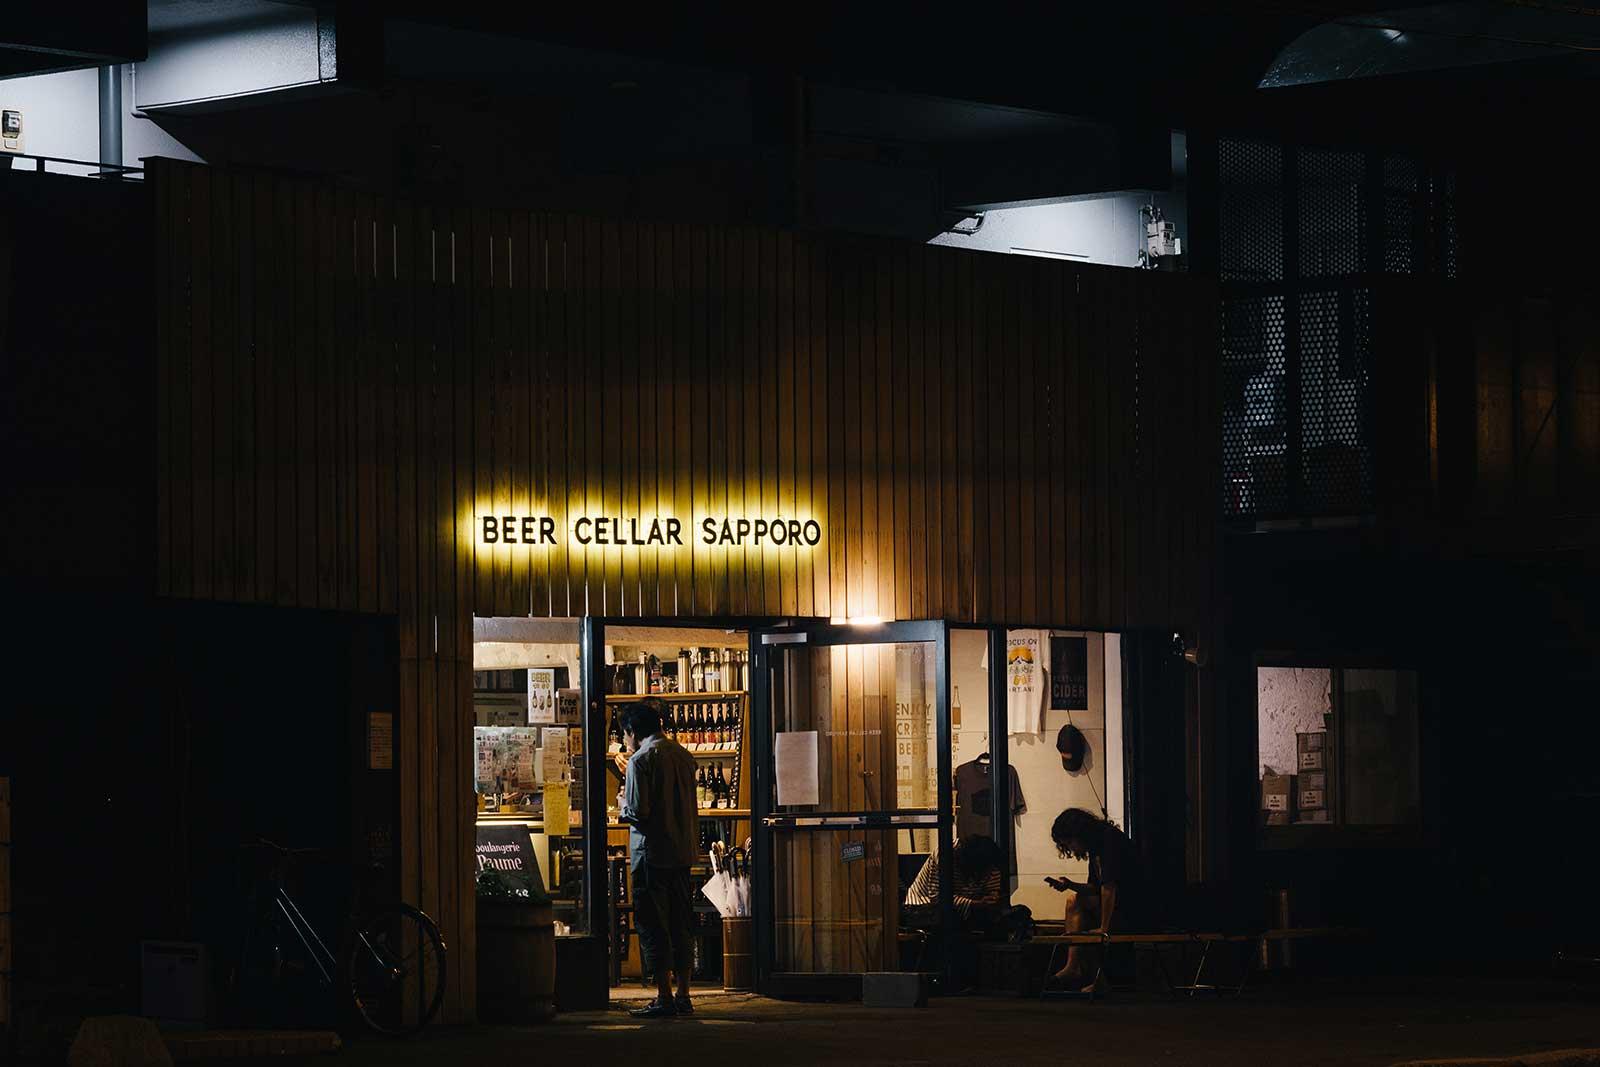 BEER CELLAR SAPPORO / ビアセラーサッポロ 大丸札幌店